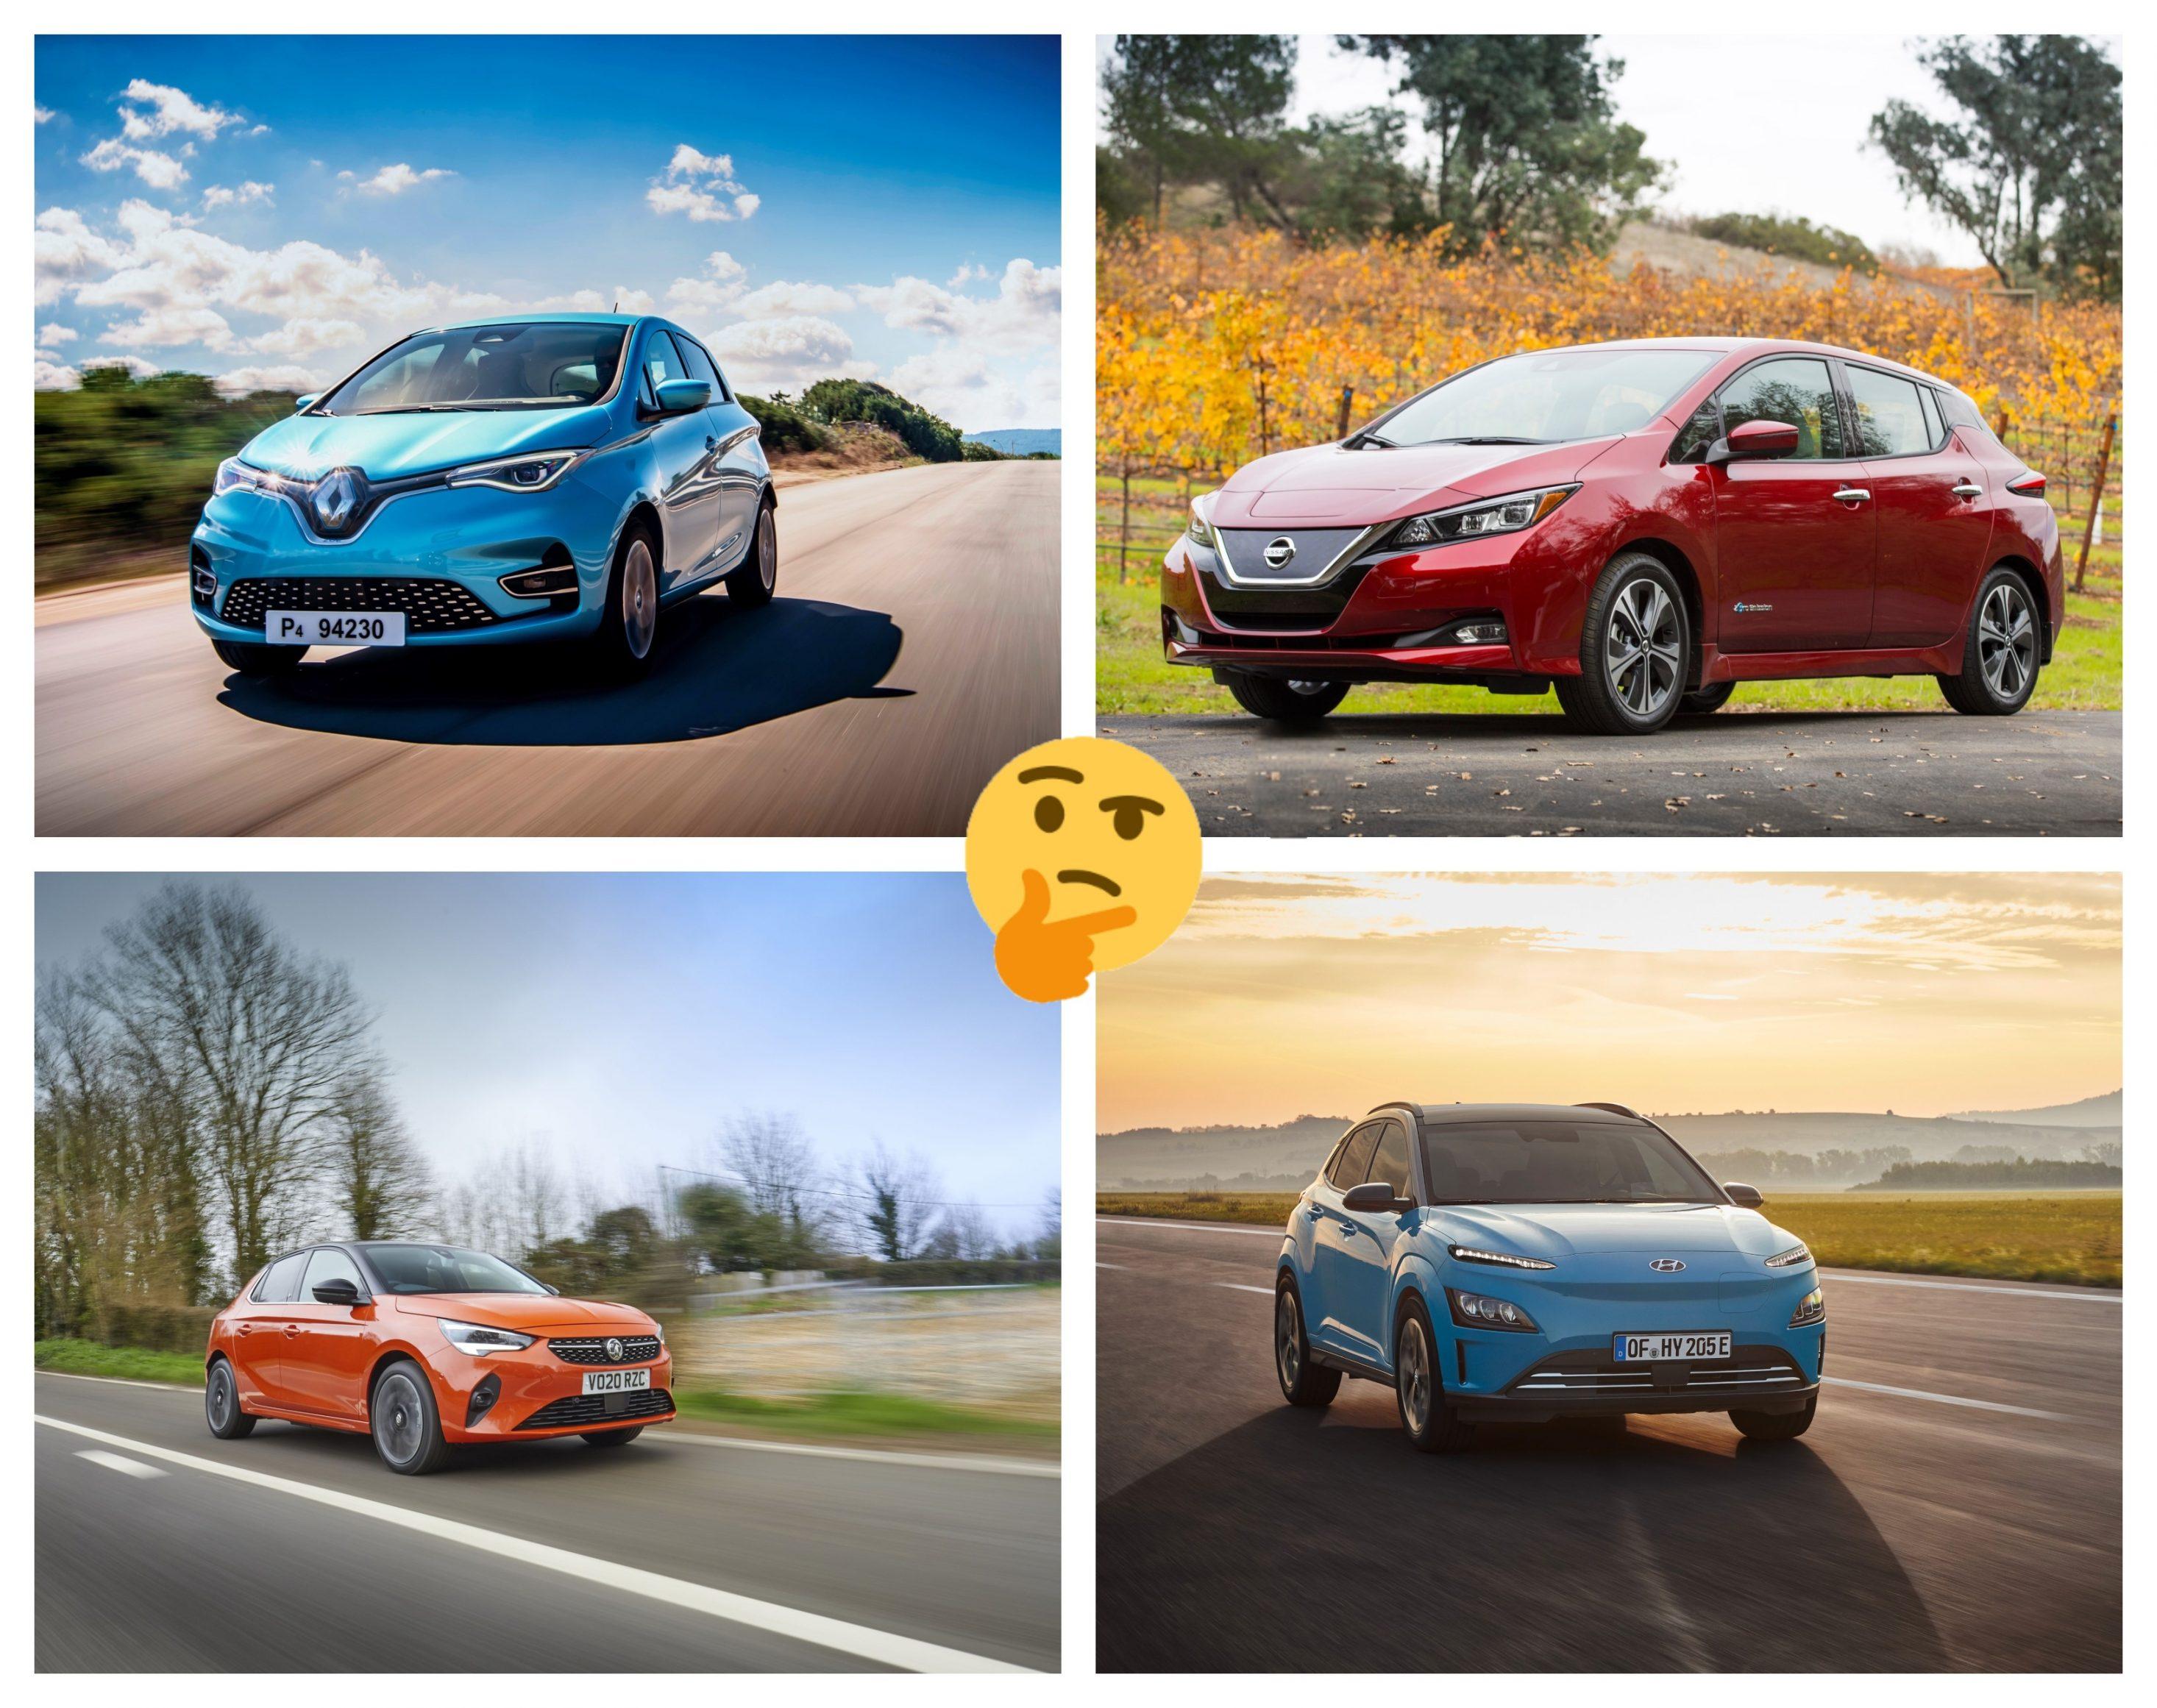 electric car lease comparison - choosing an EV